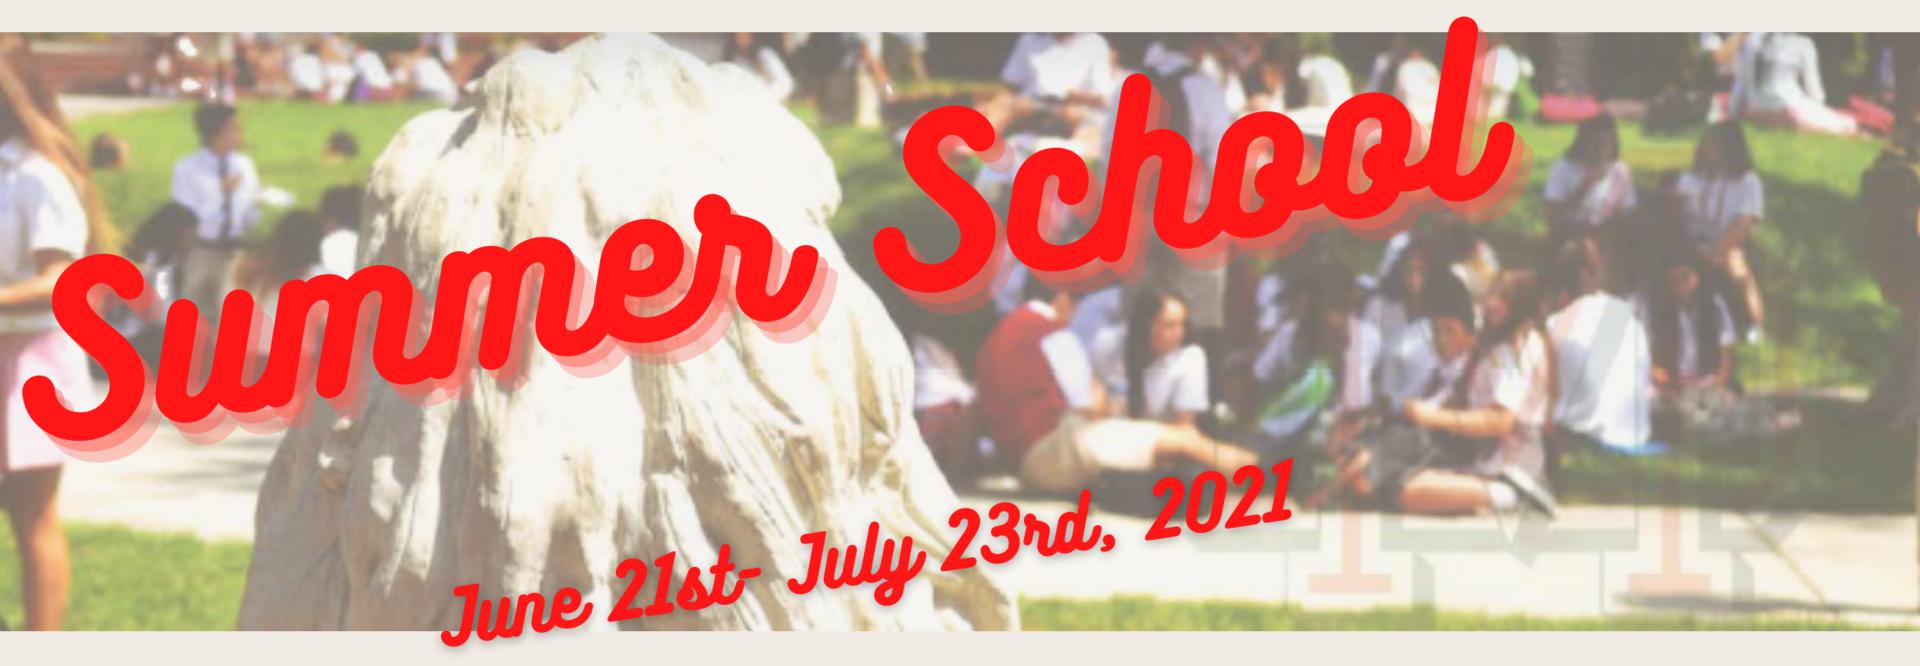 Summer School 2021, June 21st-July 23rd